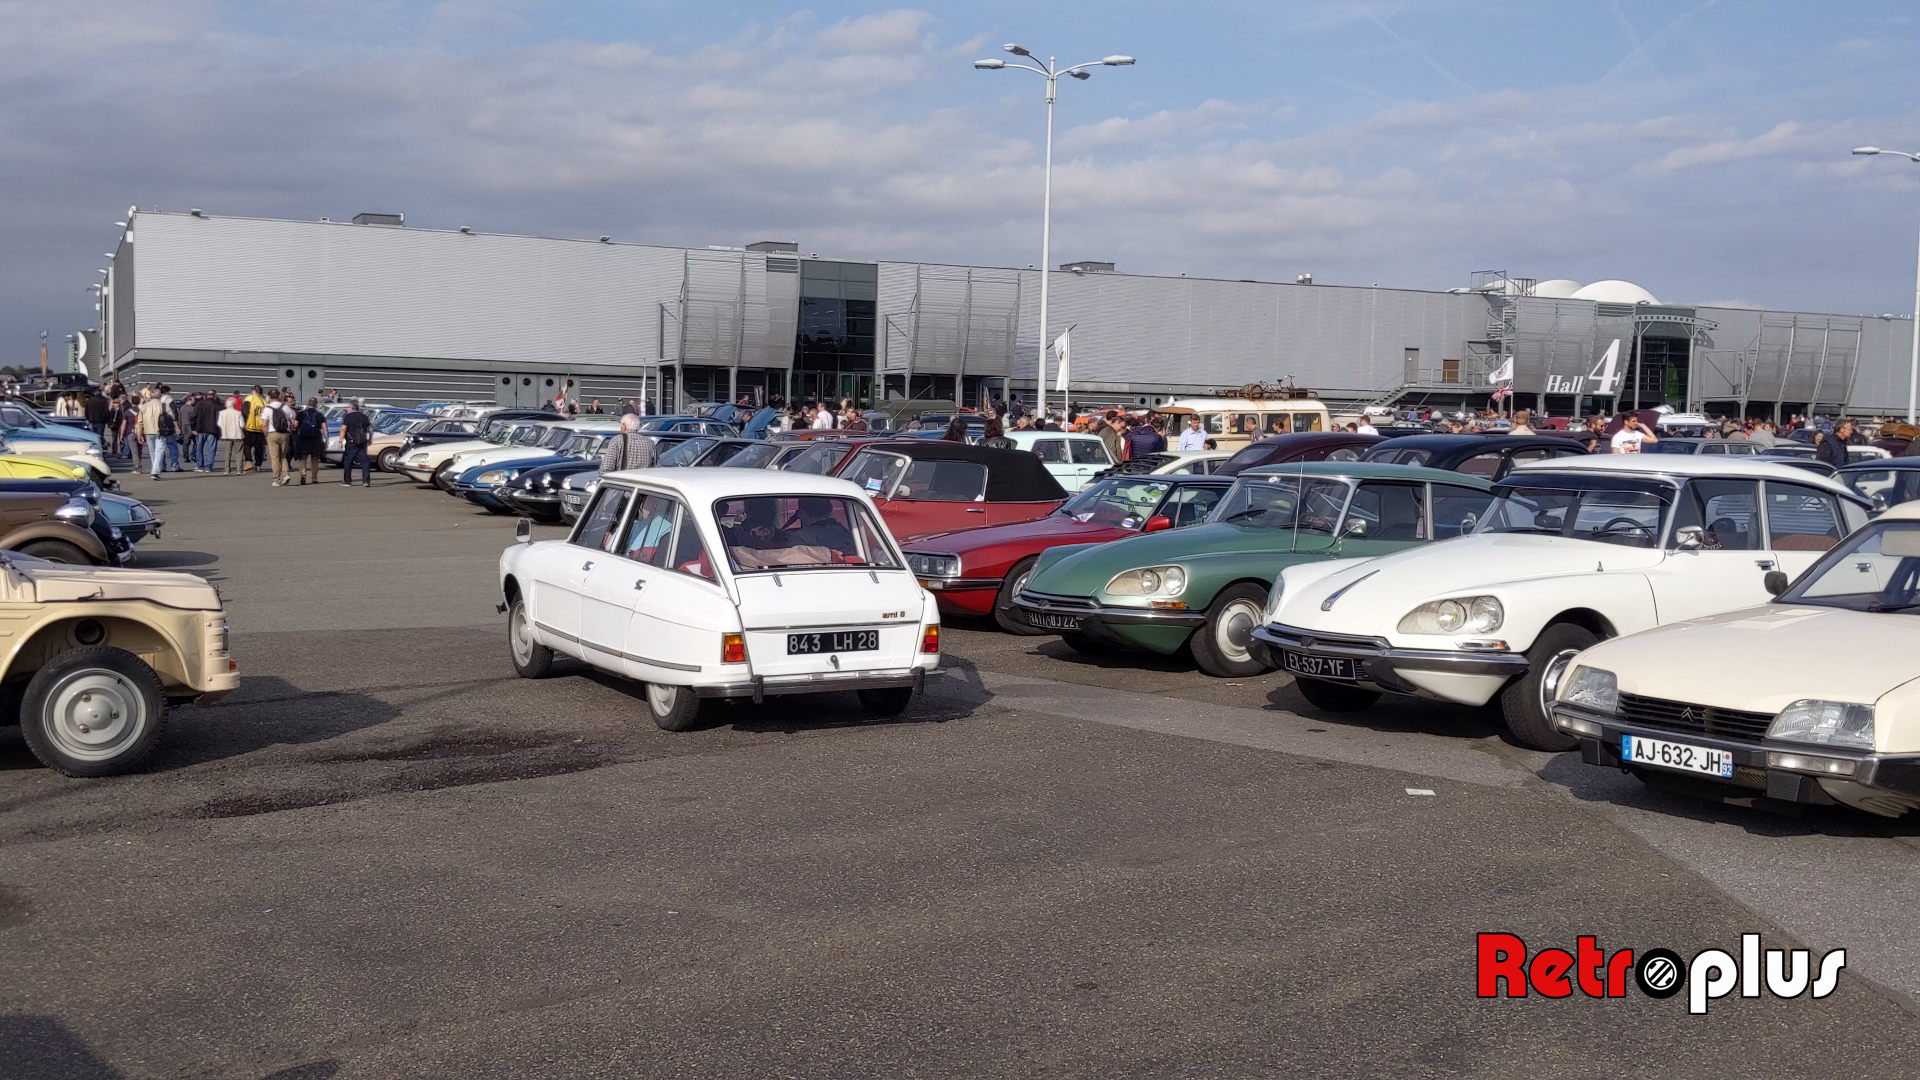 Automedon2019-parkingCitroen58